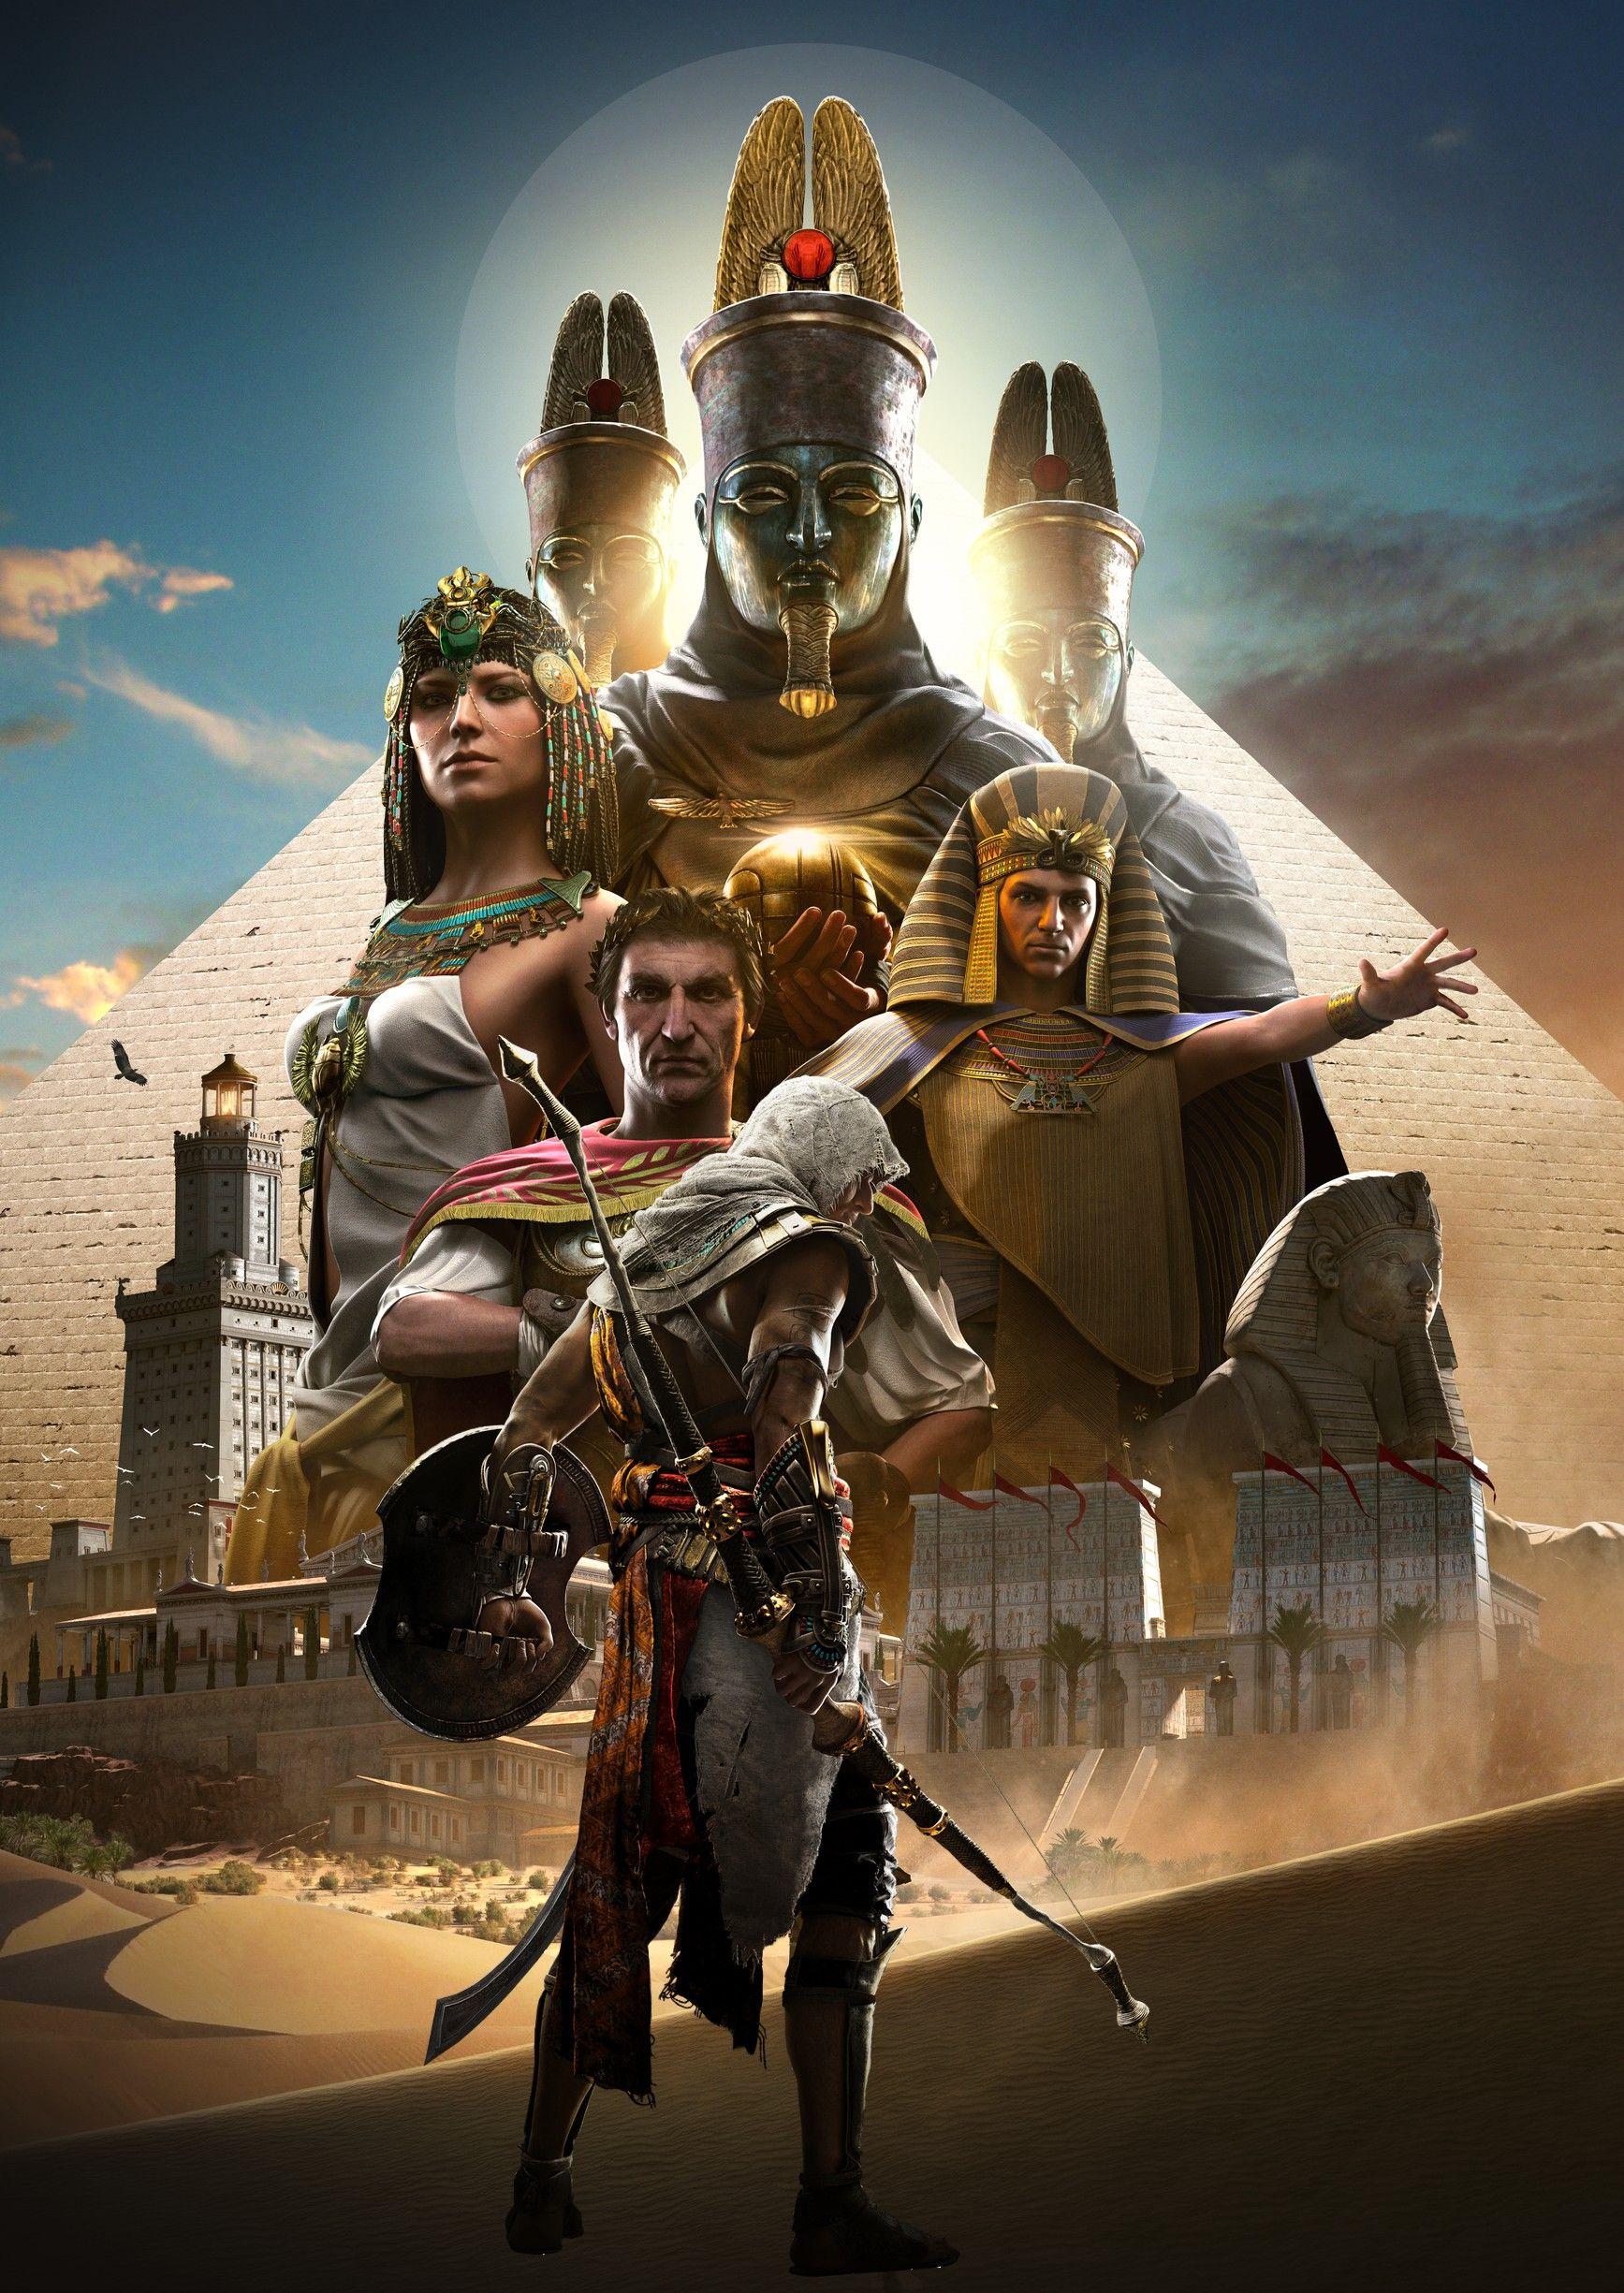 Assasin Creed Origin Empire Visit To Grab An Amazing Super Hero